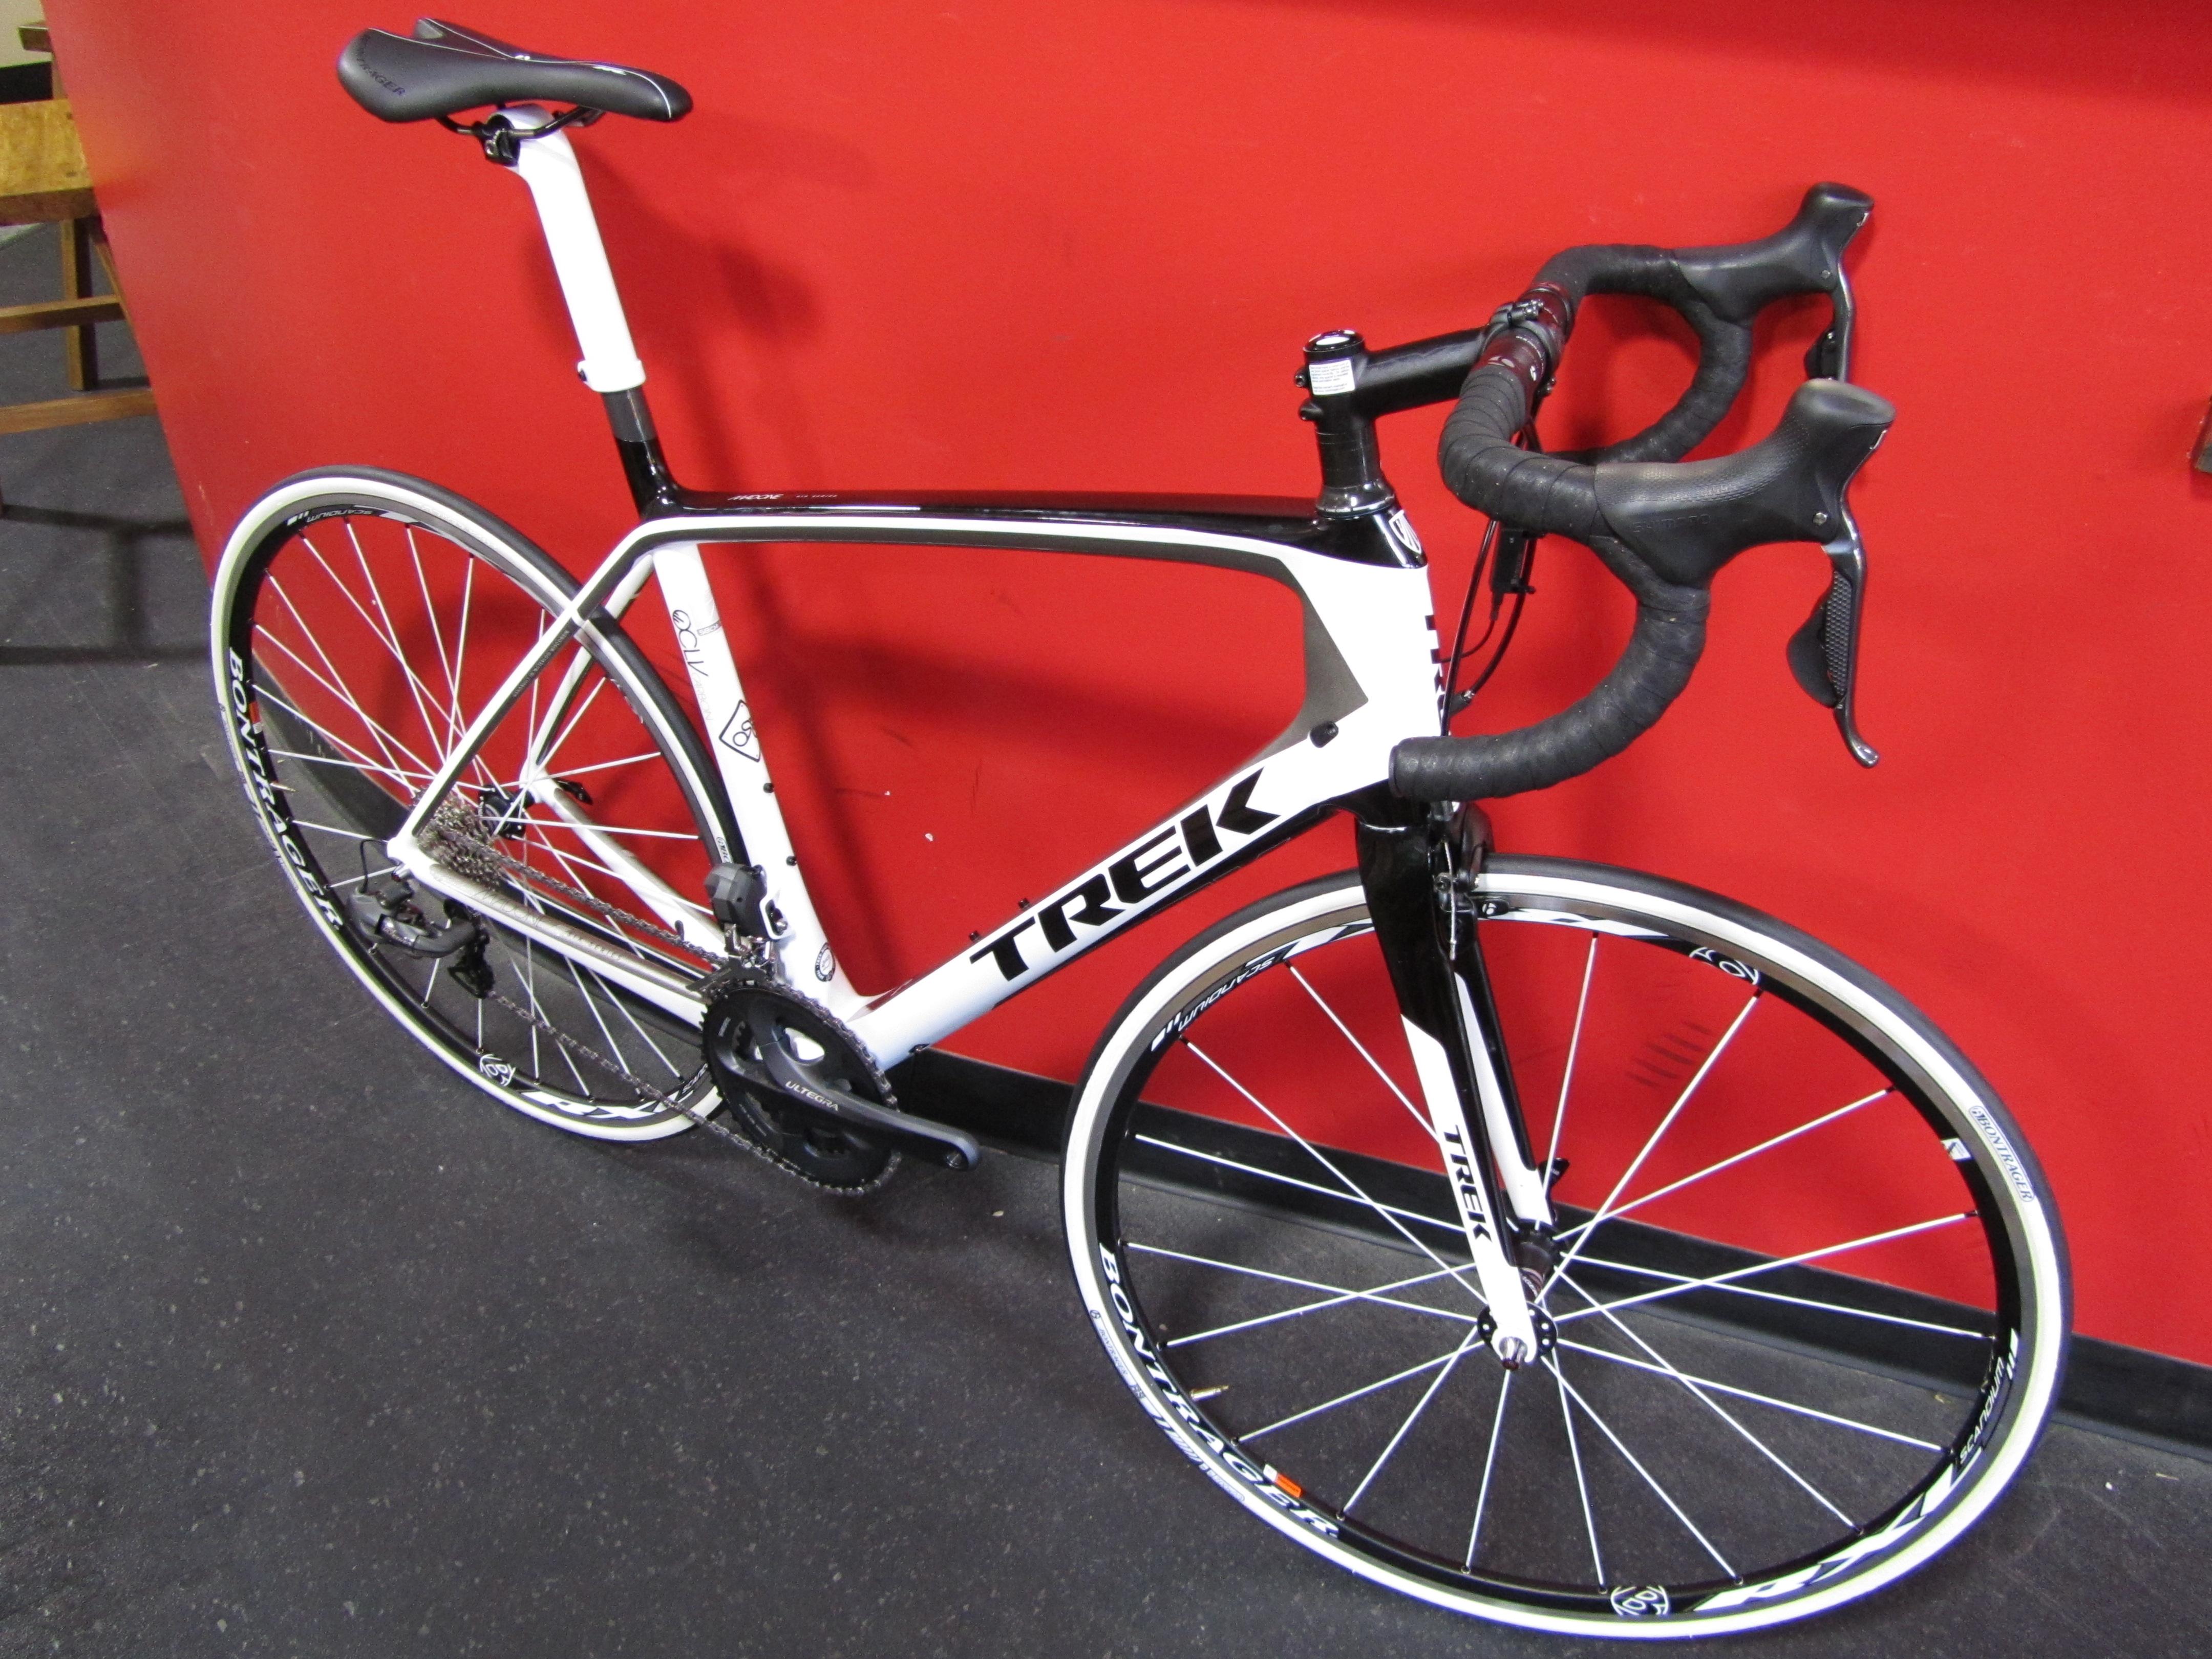 The New Trek Madone 6.5 Has Arrived | The Bike Lane Blog